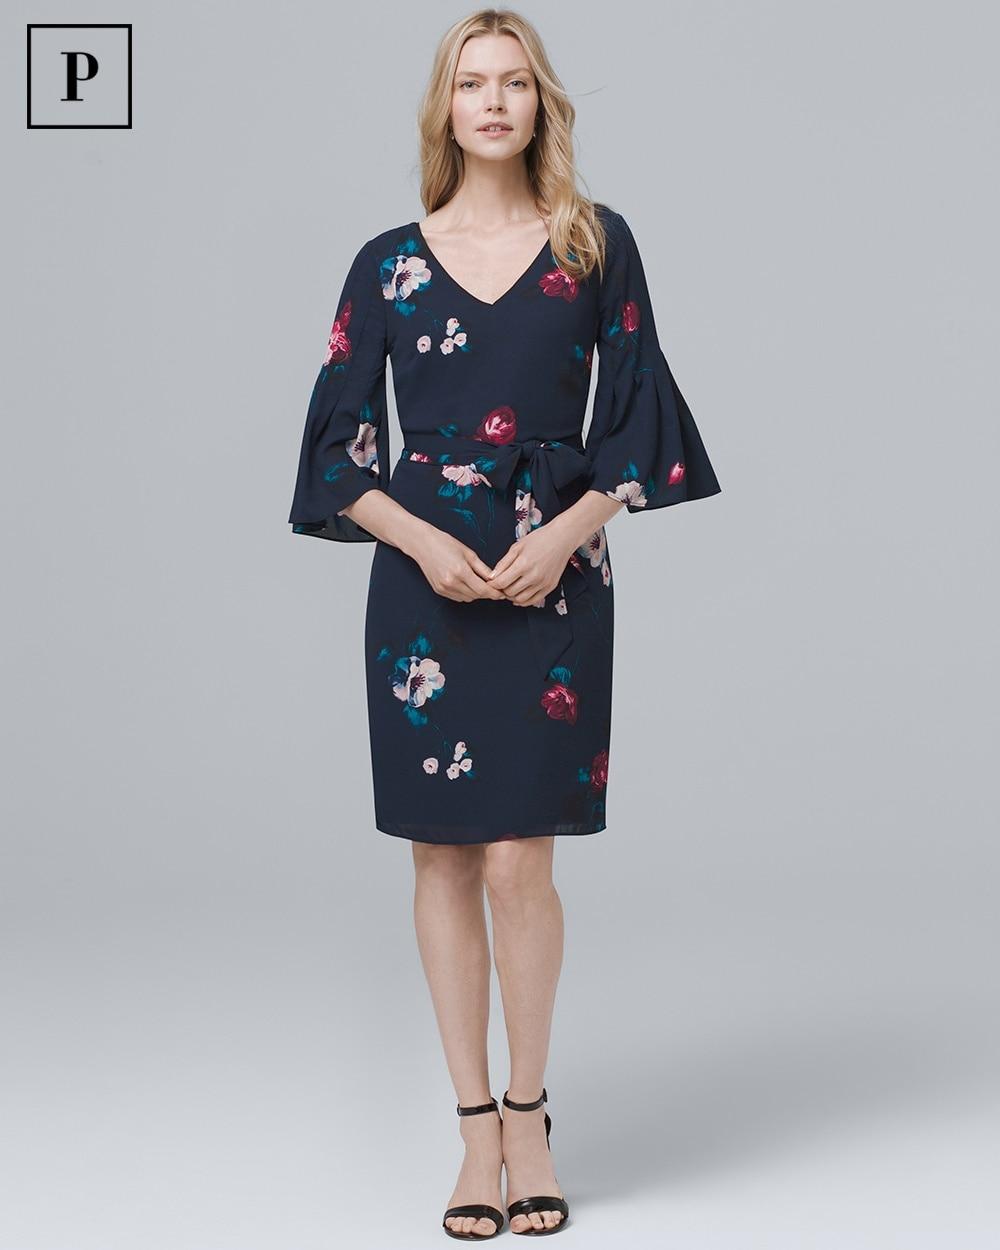 1fff97035b91 Petite Bell-Sleeve Soft Floral-Print Shift Dress - White House Black Market